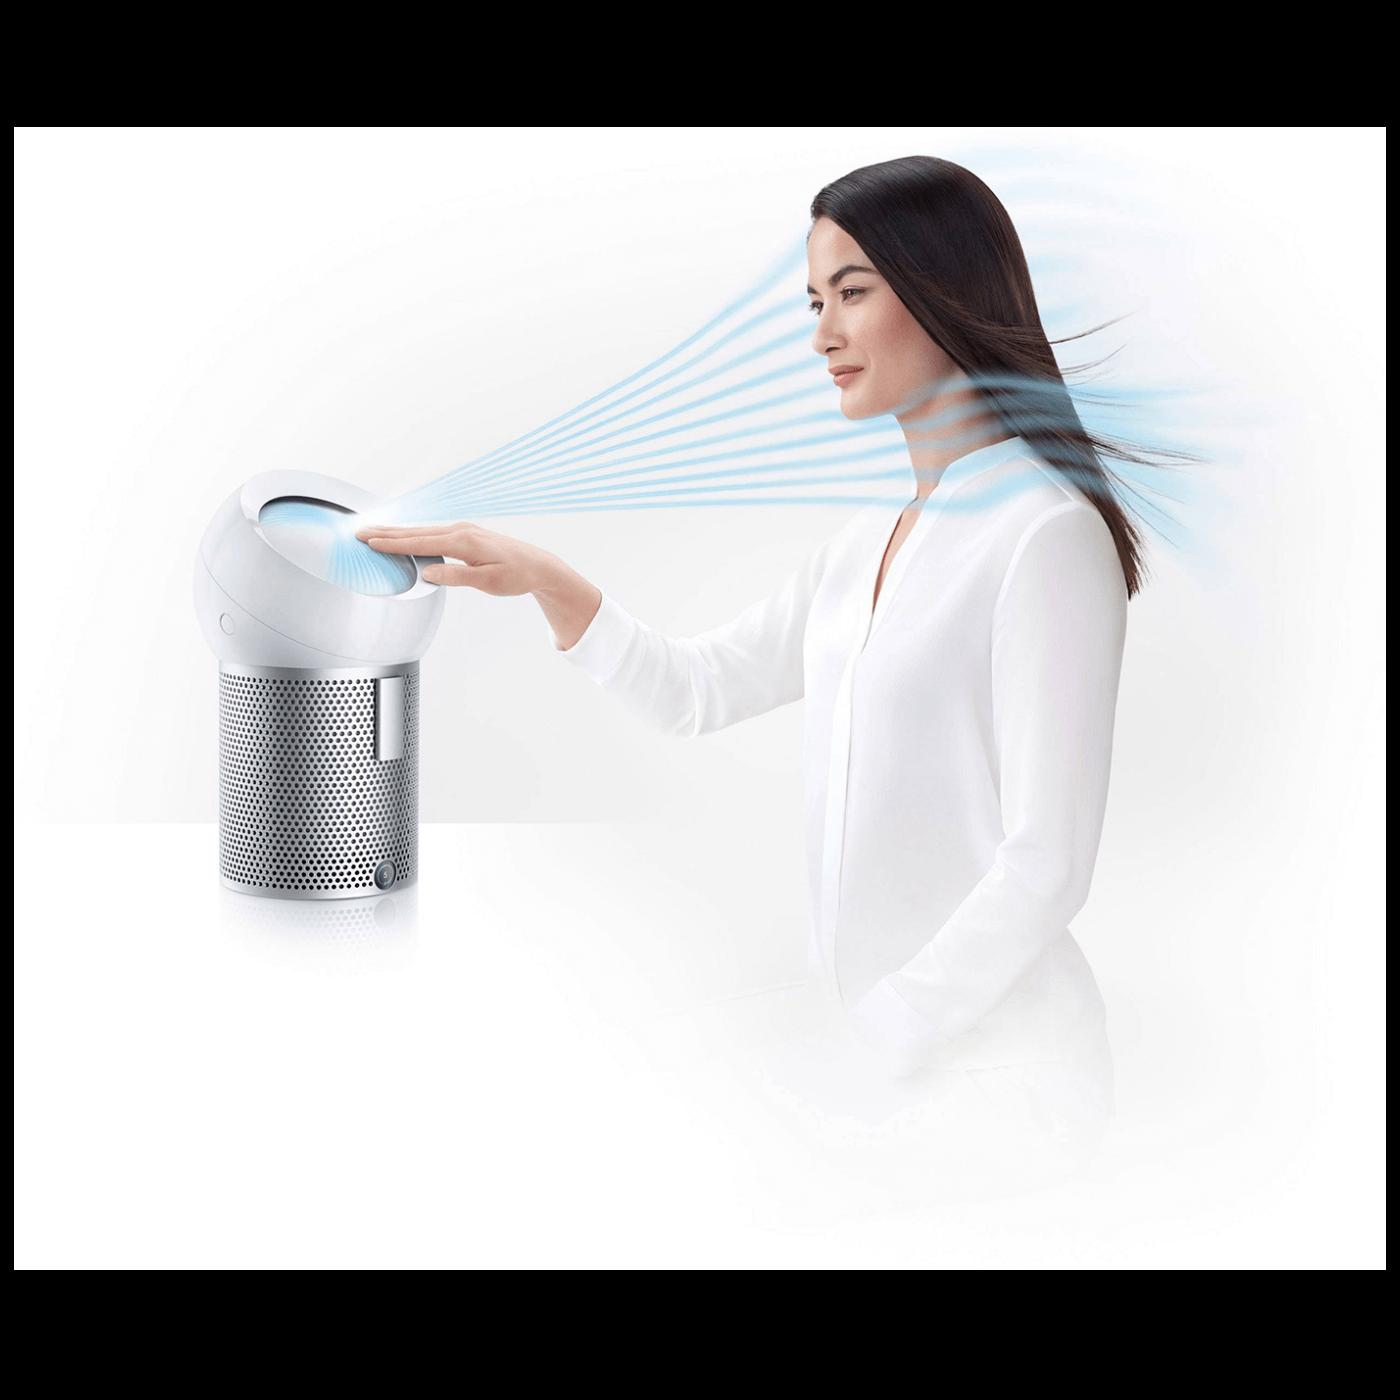 Pročišćivač zraka, hlađenje prostora